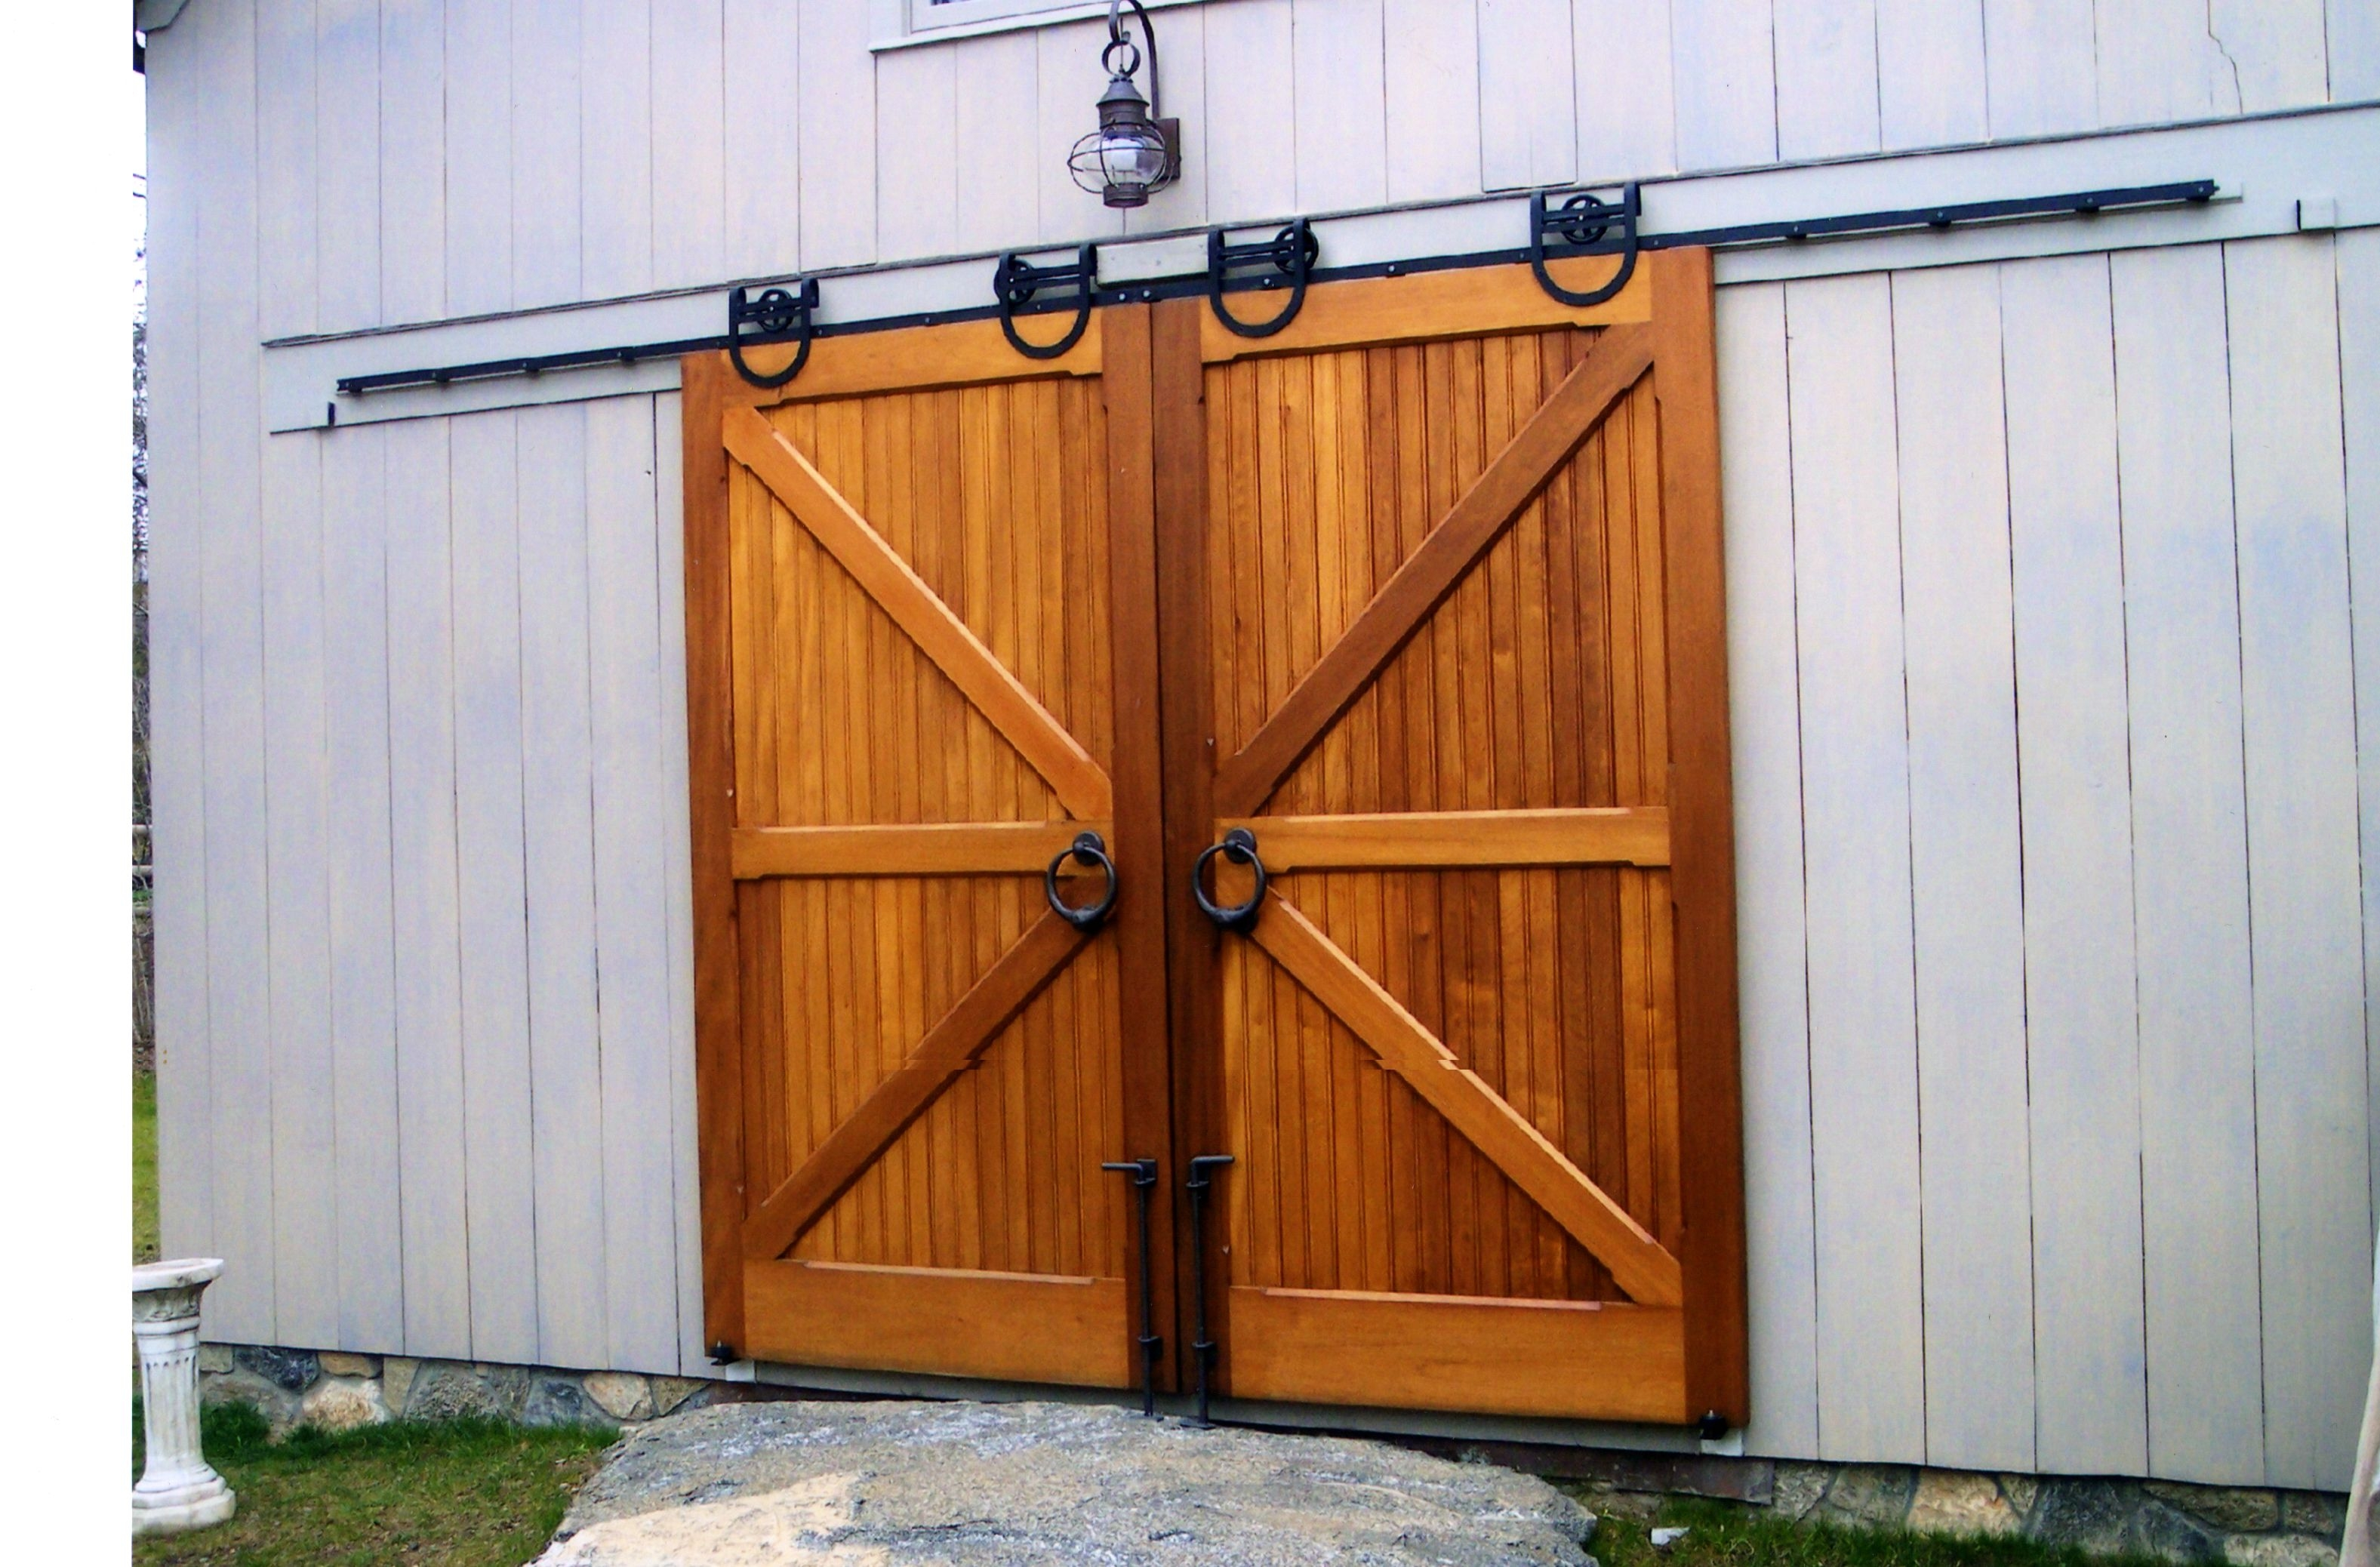 Sliding Garage Door Track Systemcustom garage doors residential garage doors new garage door